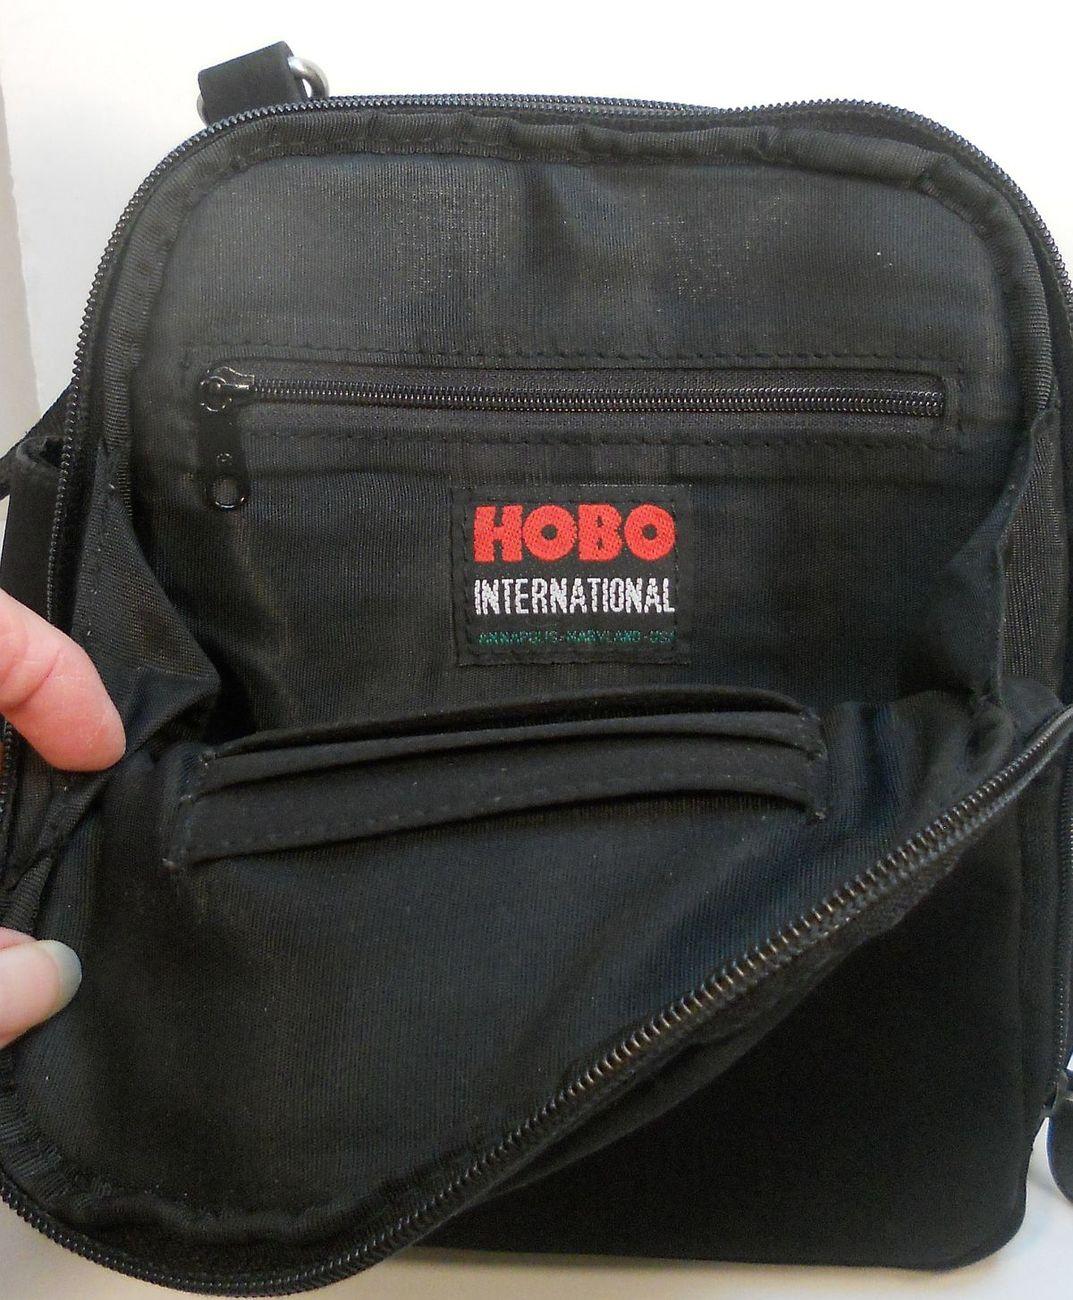 Women Zip Purse Hobo Travel Camp Hiking Card Holder Coin ... |Hobo Travel